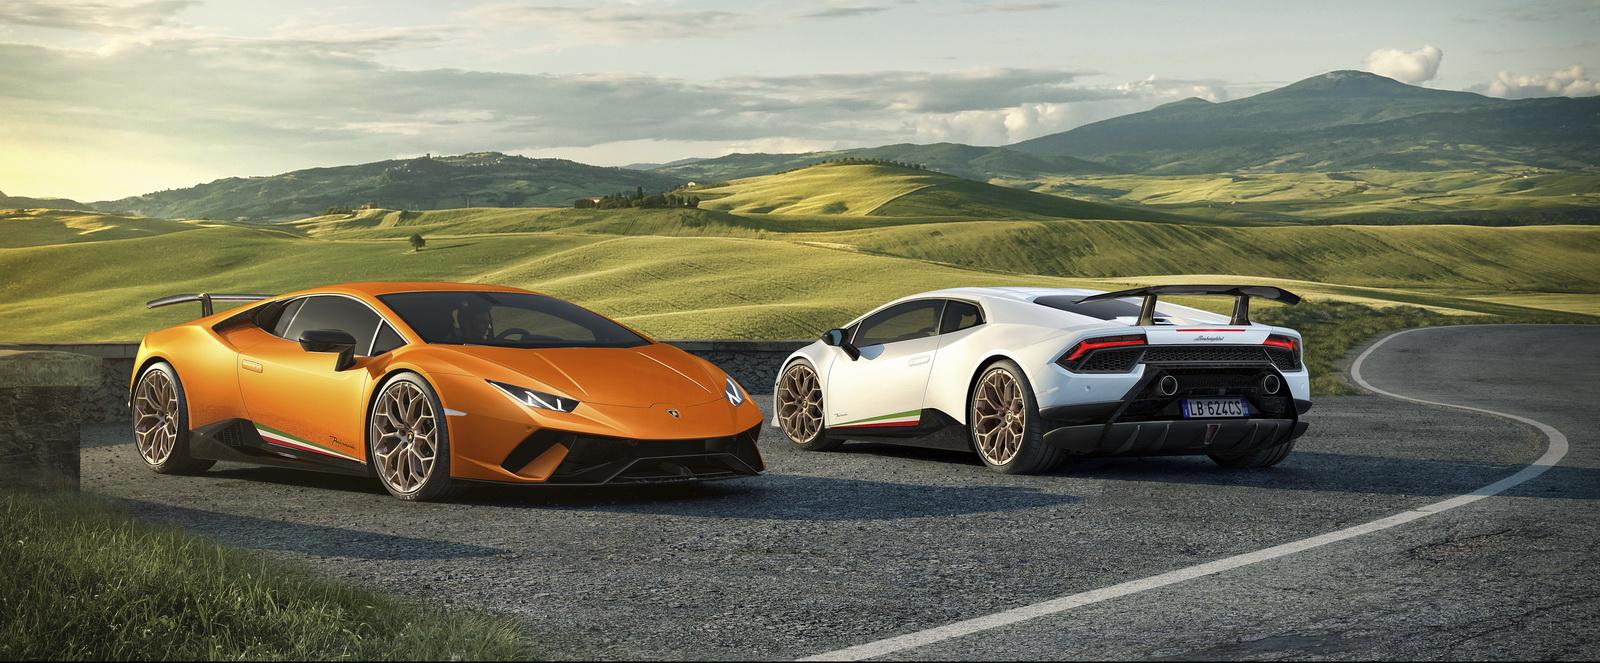 Lamborghini Huracan Performante 2018 (13)